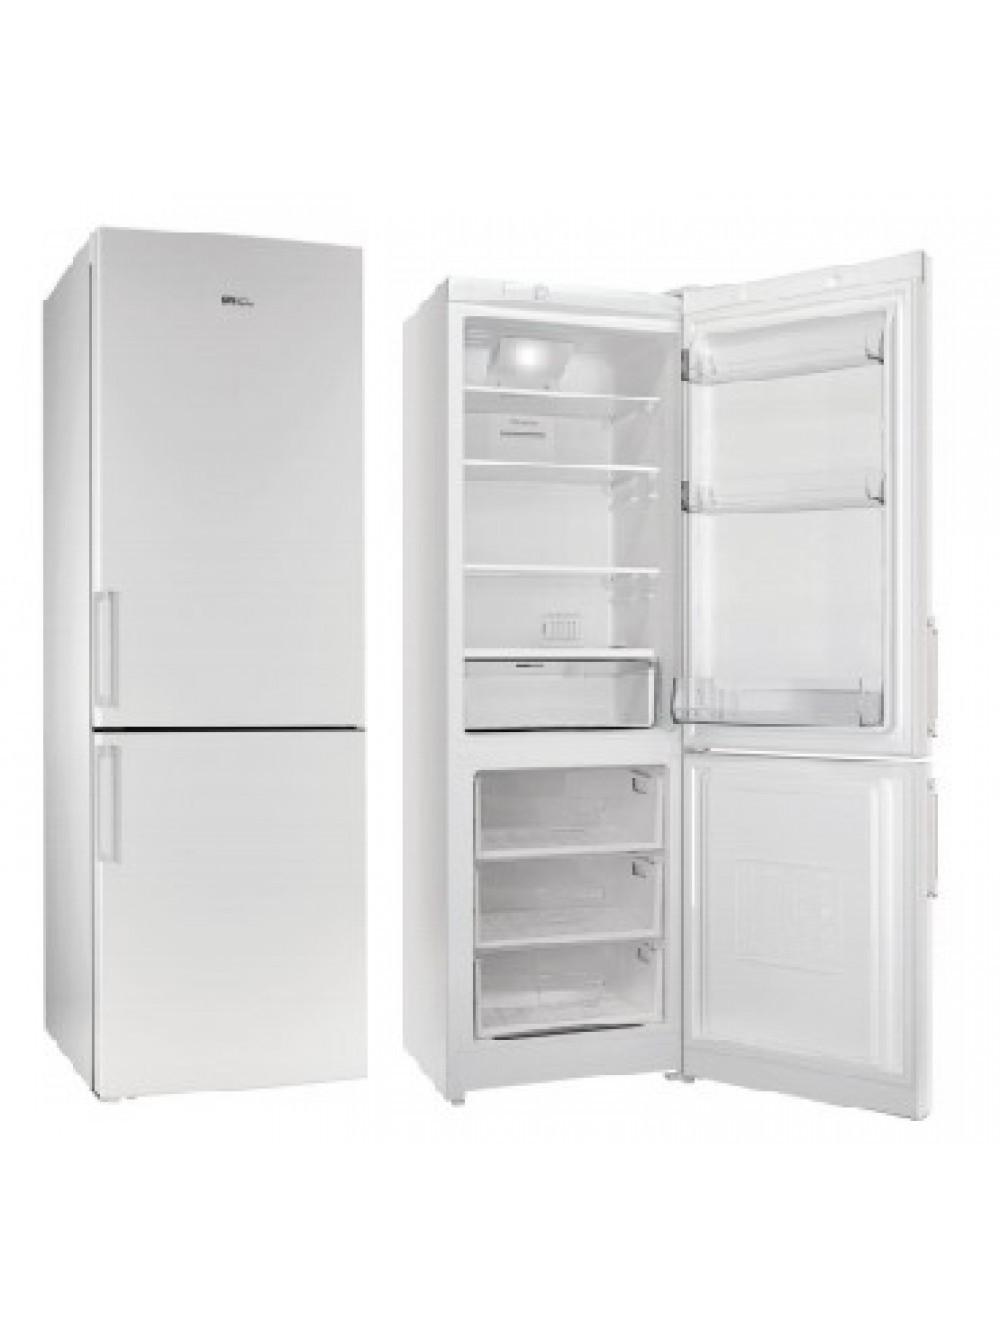 Холодильник с ноу фрост недорого